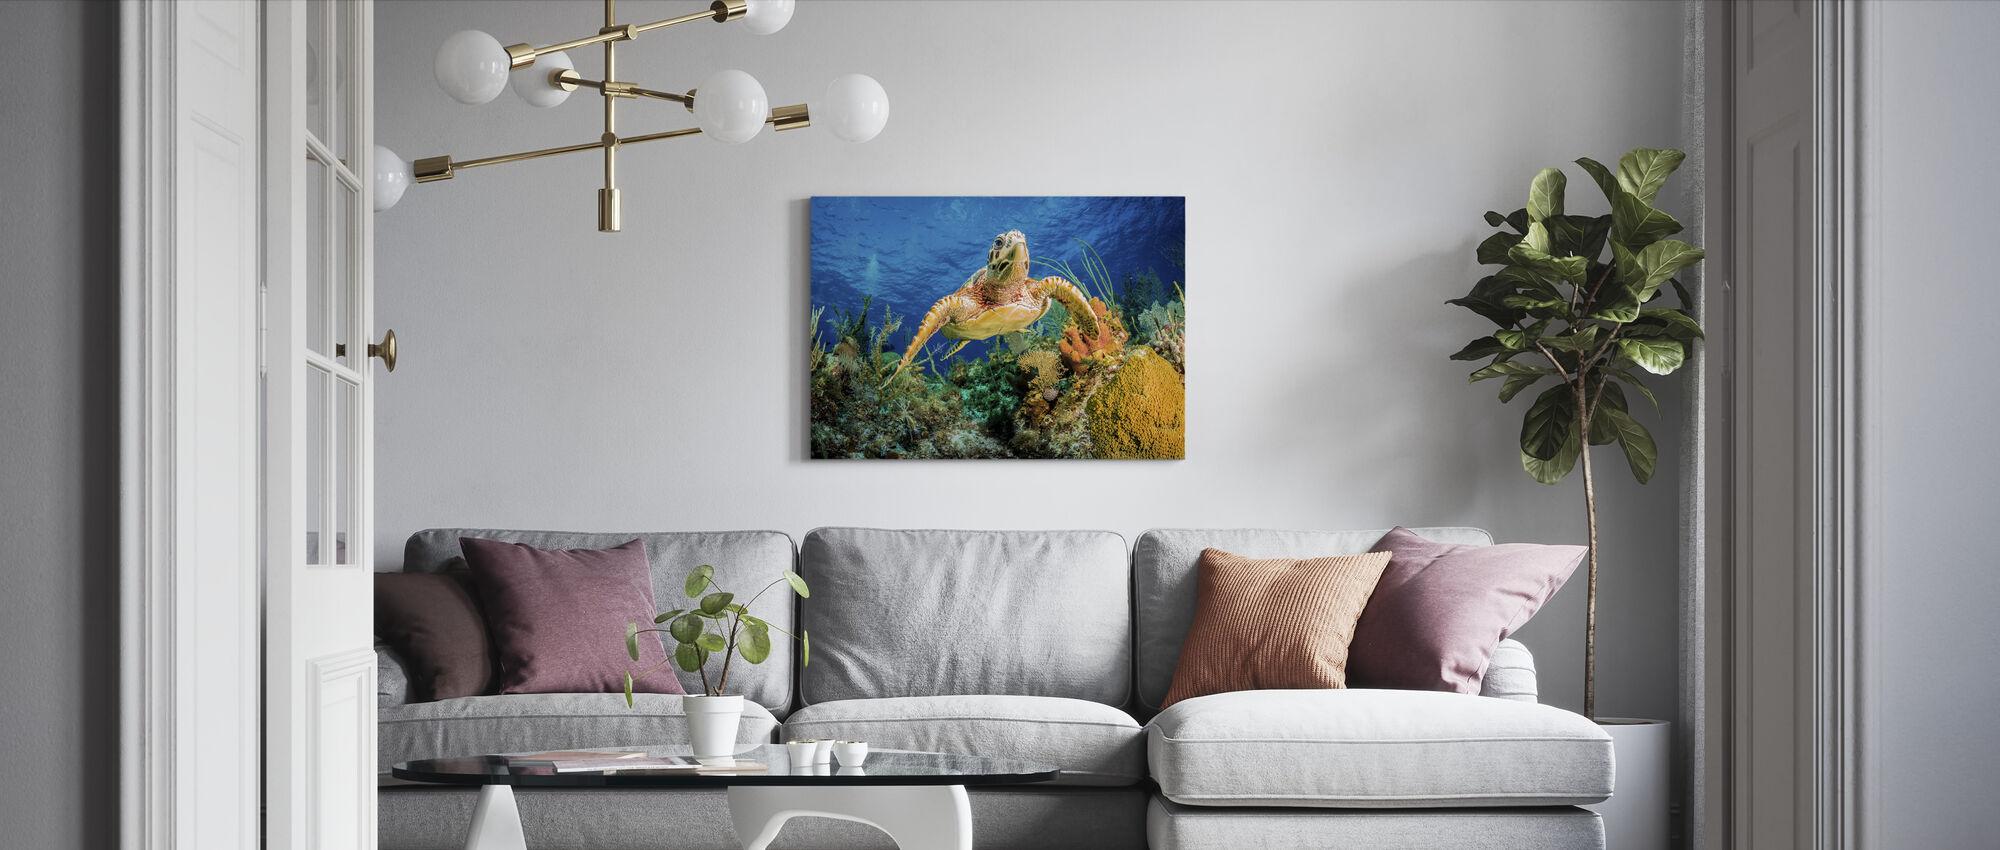 Hawksbill Turtle Swimming - Canvas print - Living Room